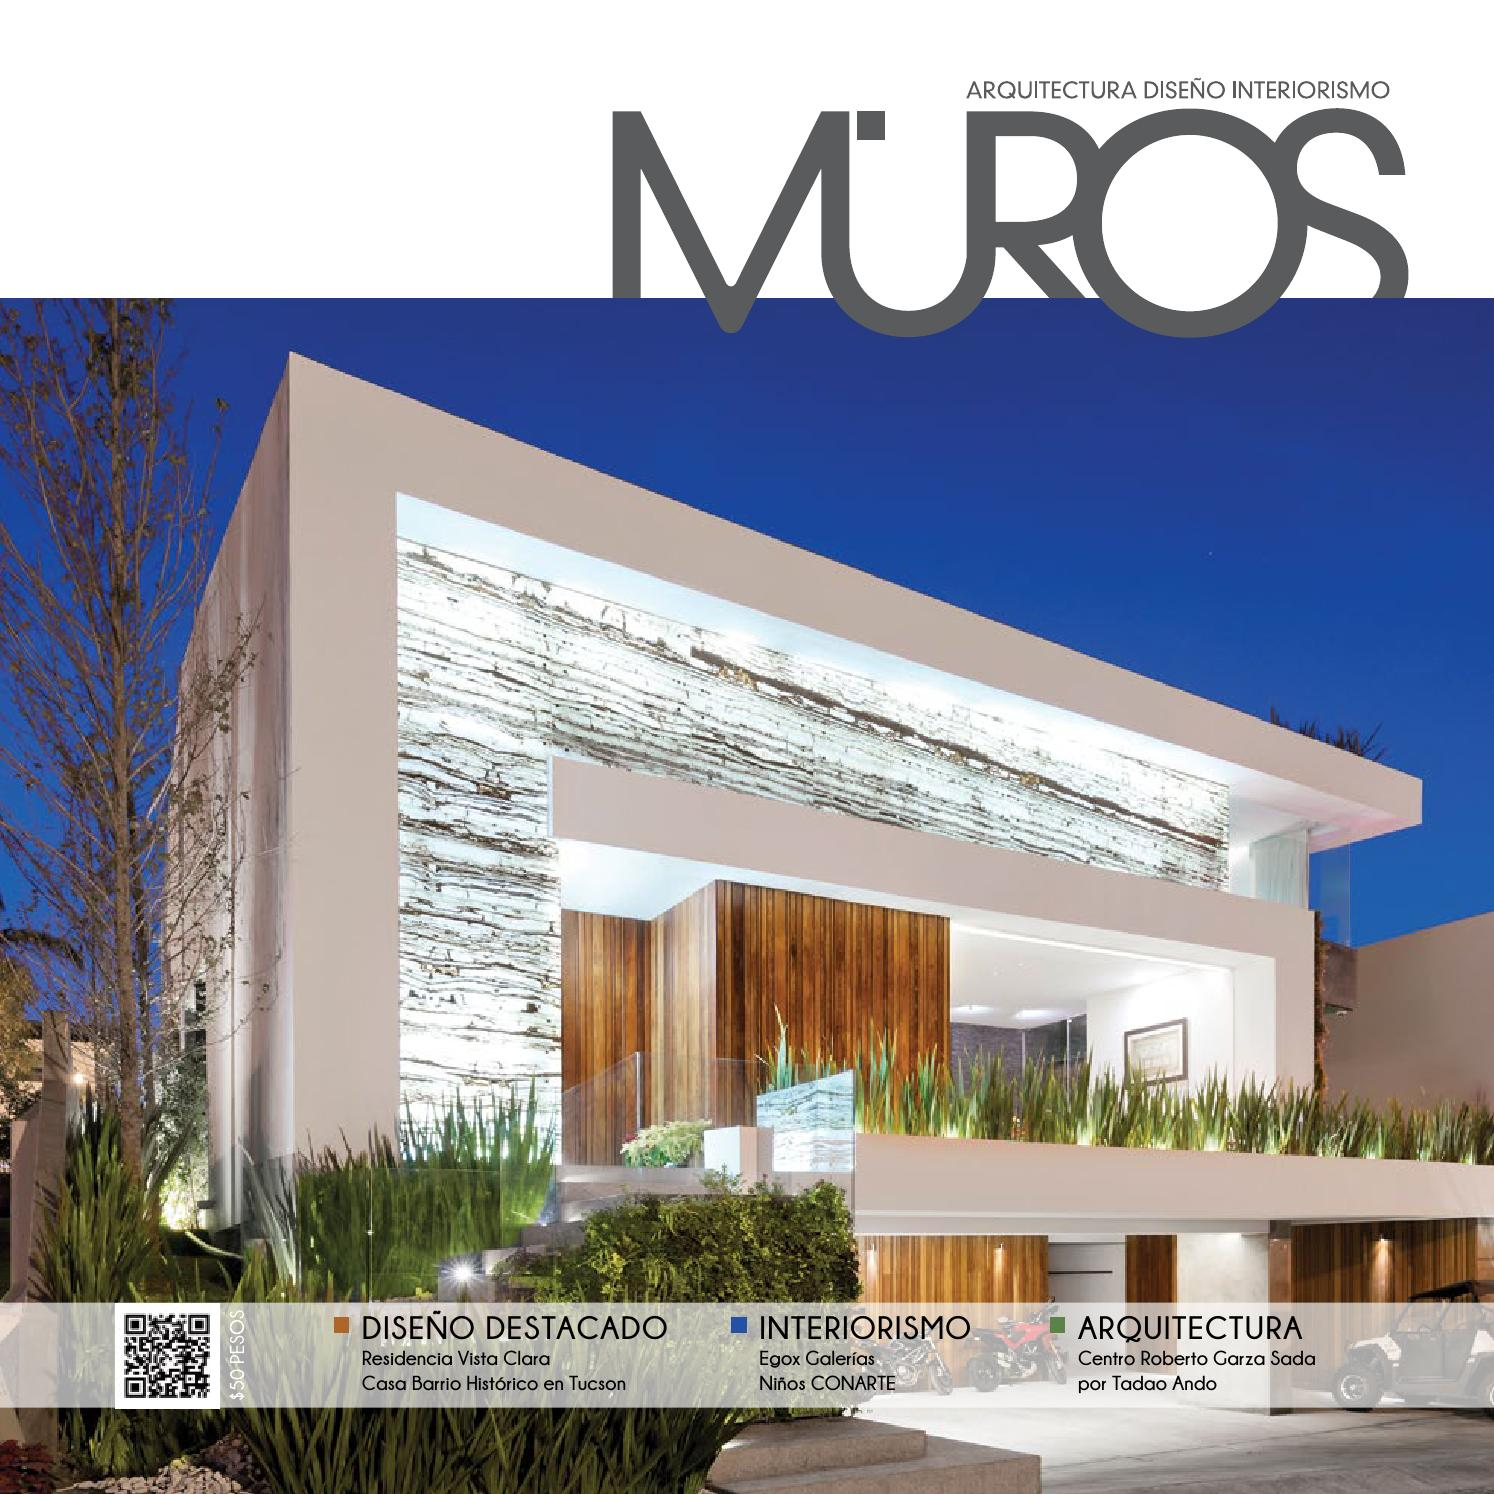 Edici n 11 revista muros arquitectura dise o for Arte arquitectura y diseno definicion